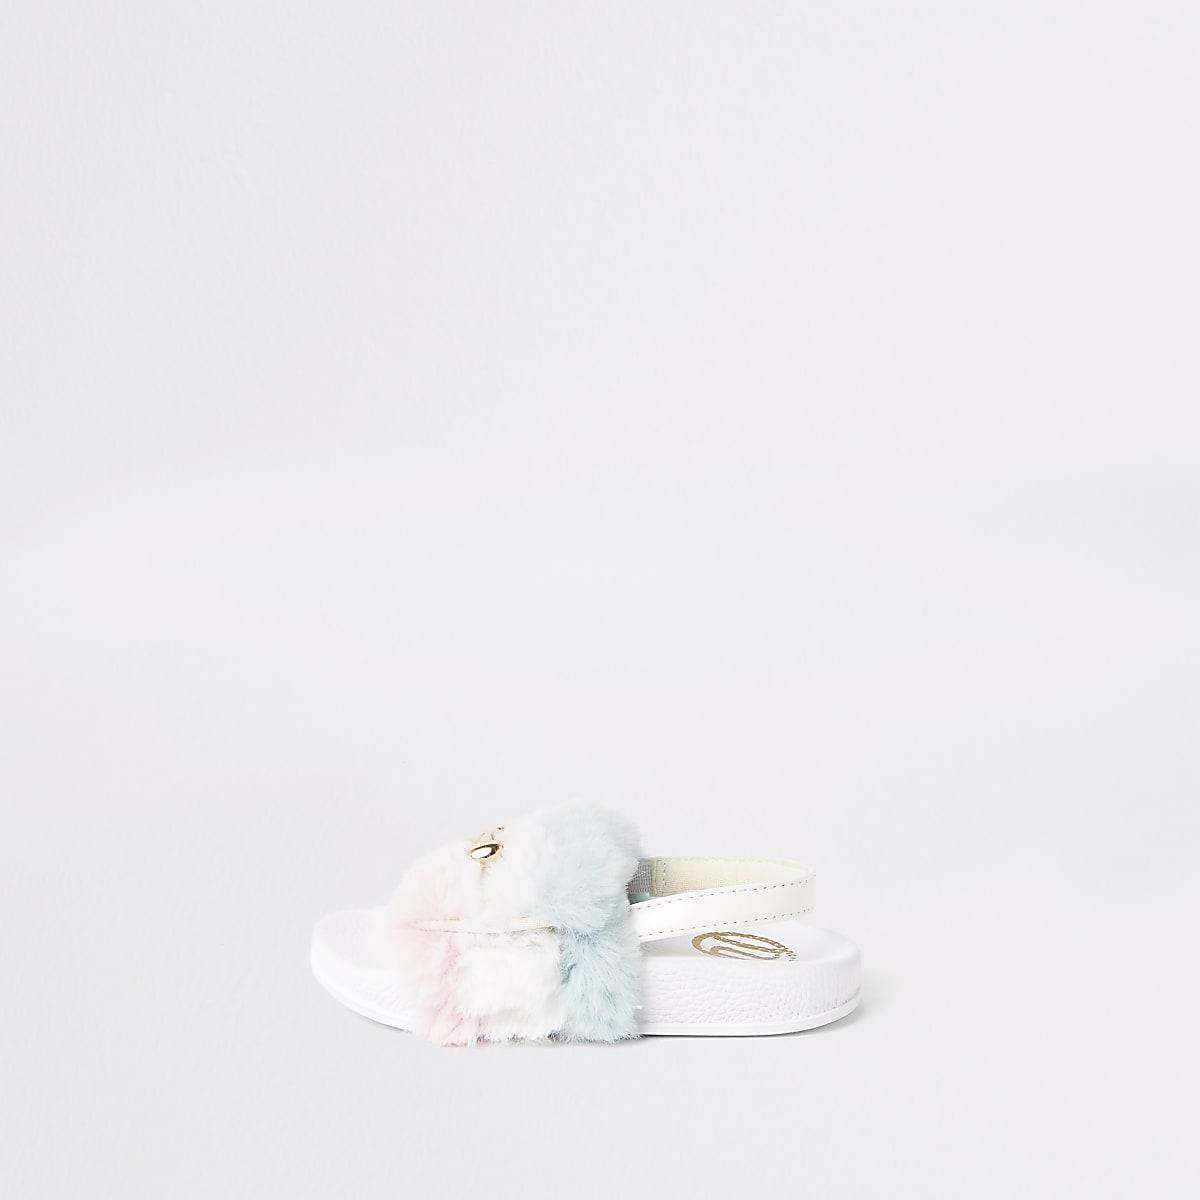 Mini - Witte slippers met imitatiebont en kettinkje voor meisjes